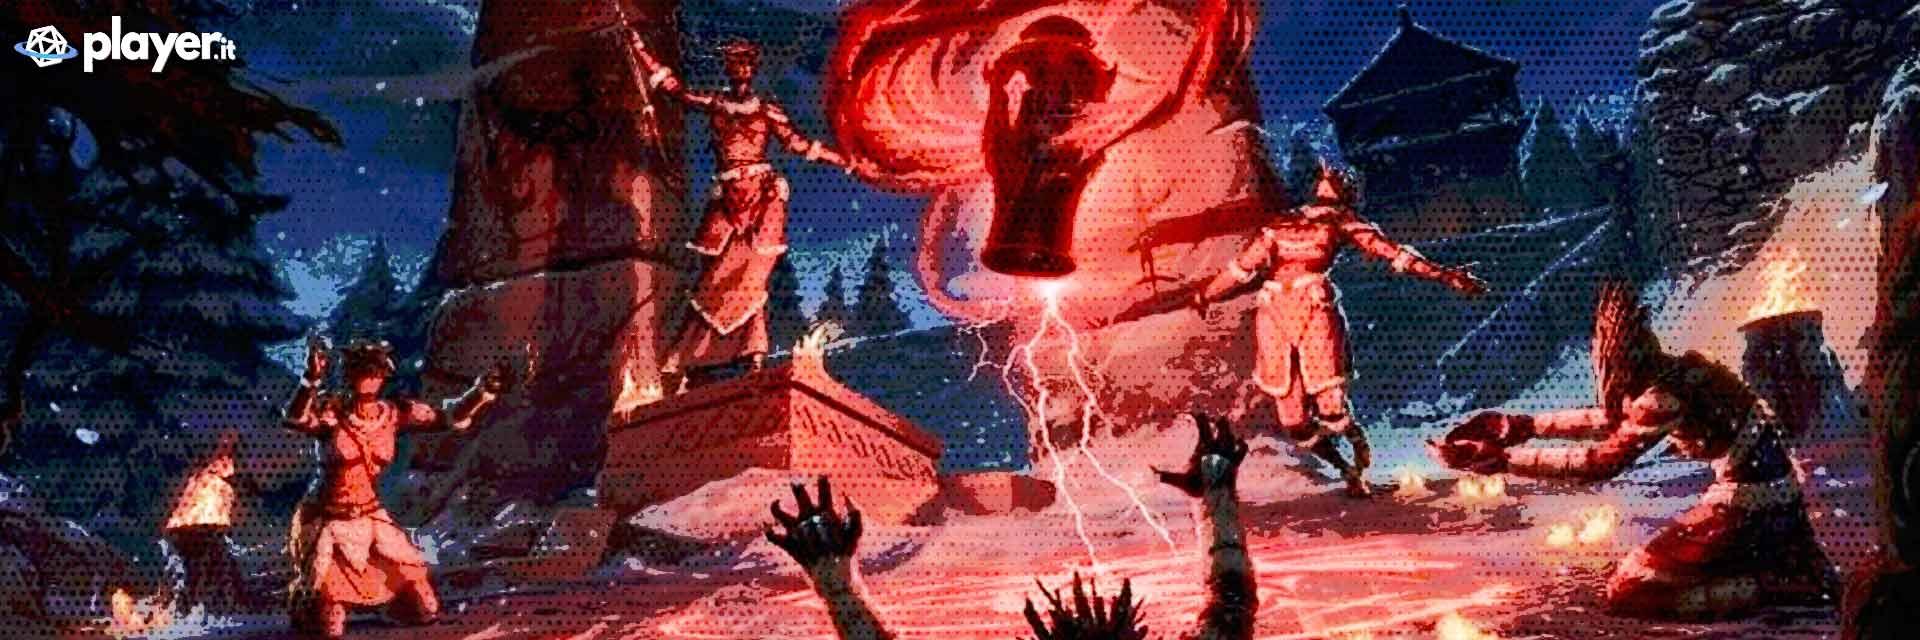 immagine in evidenza del gioco The Elder Scrolls Online - Harrowstorm (DLC)